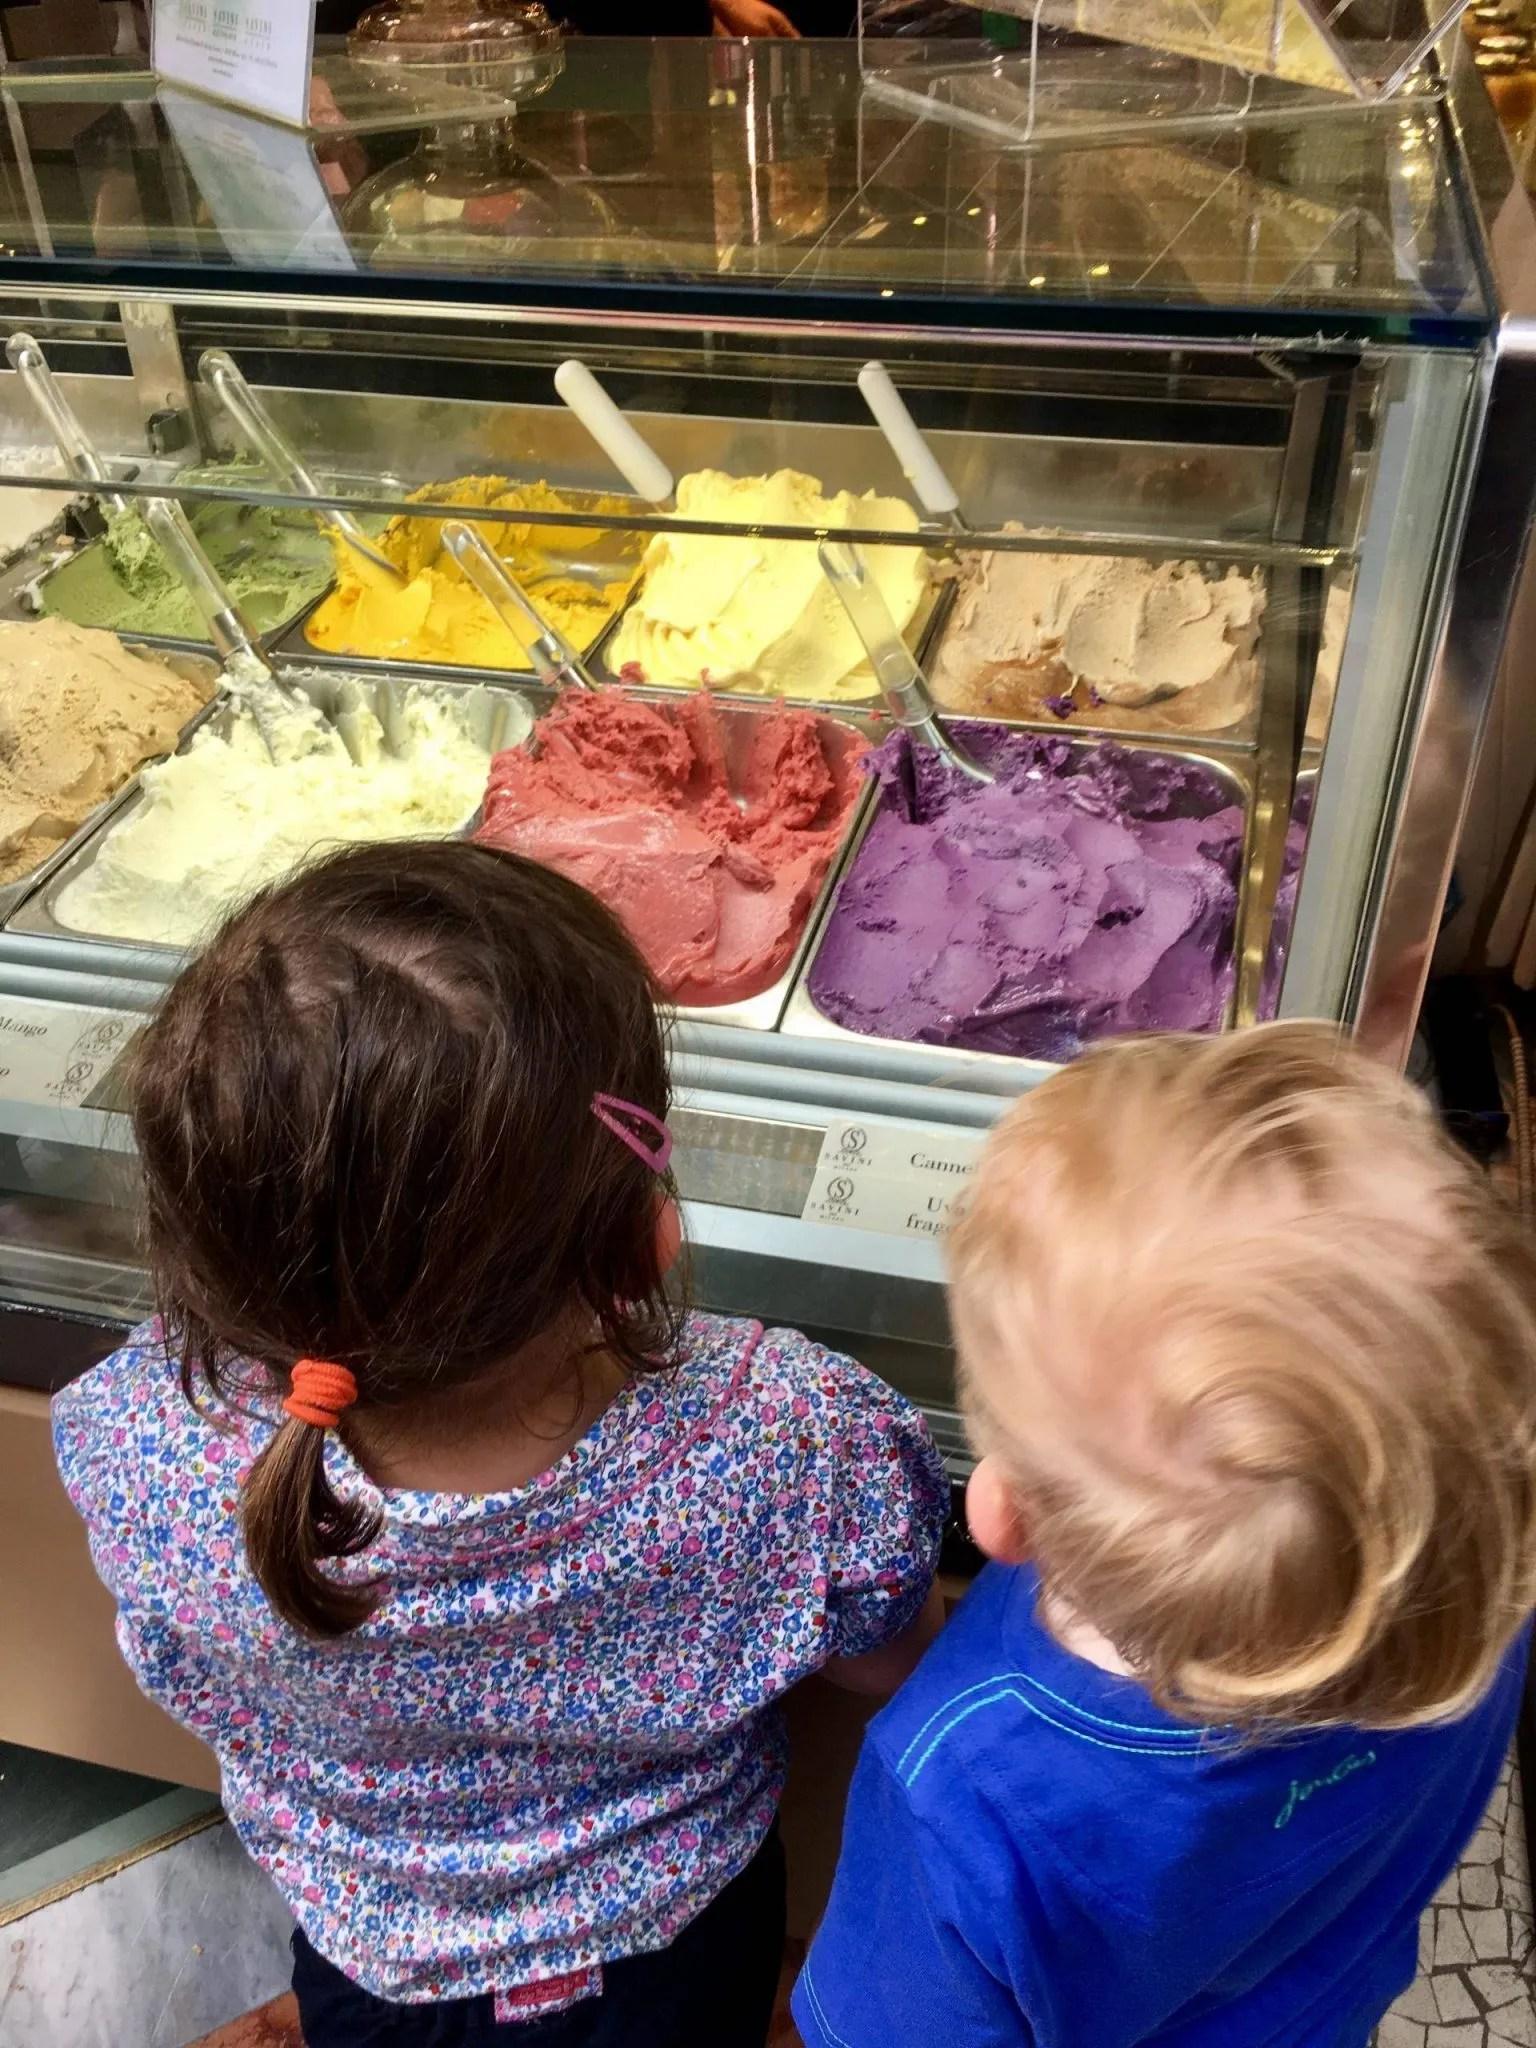 adventures of a gluten free globetrekker Went - Ate - Loved: June 2017 Monthly Round Up